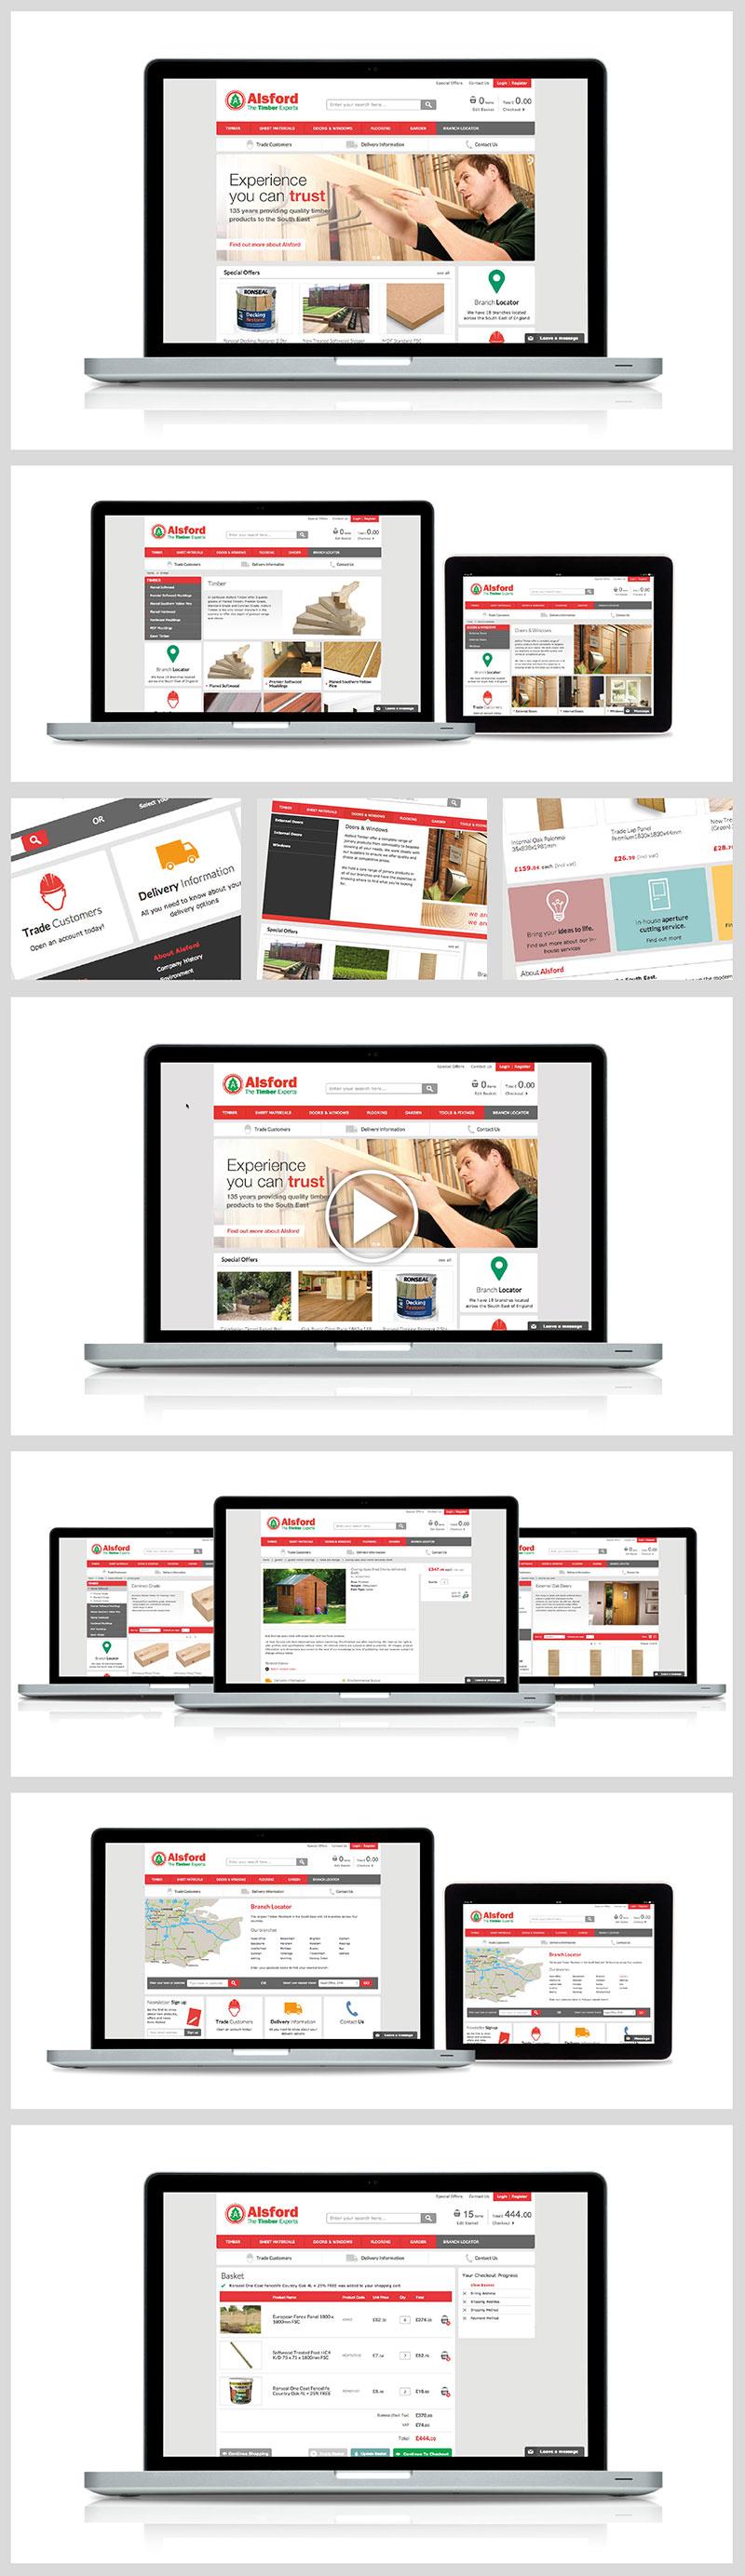 alsford-timber_ecommerce-website-pinterest